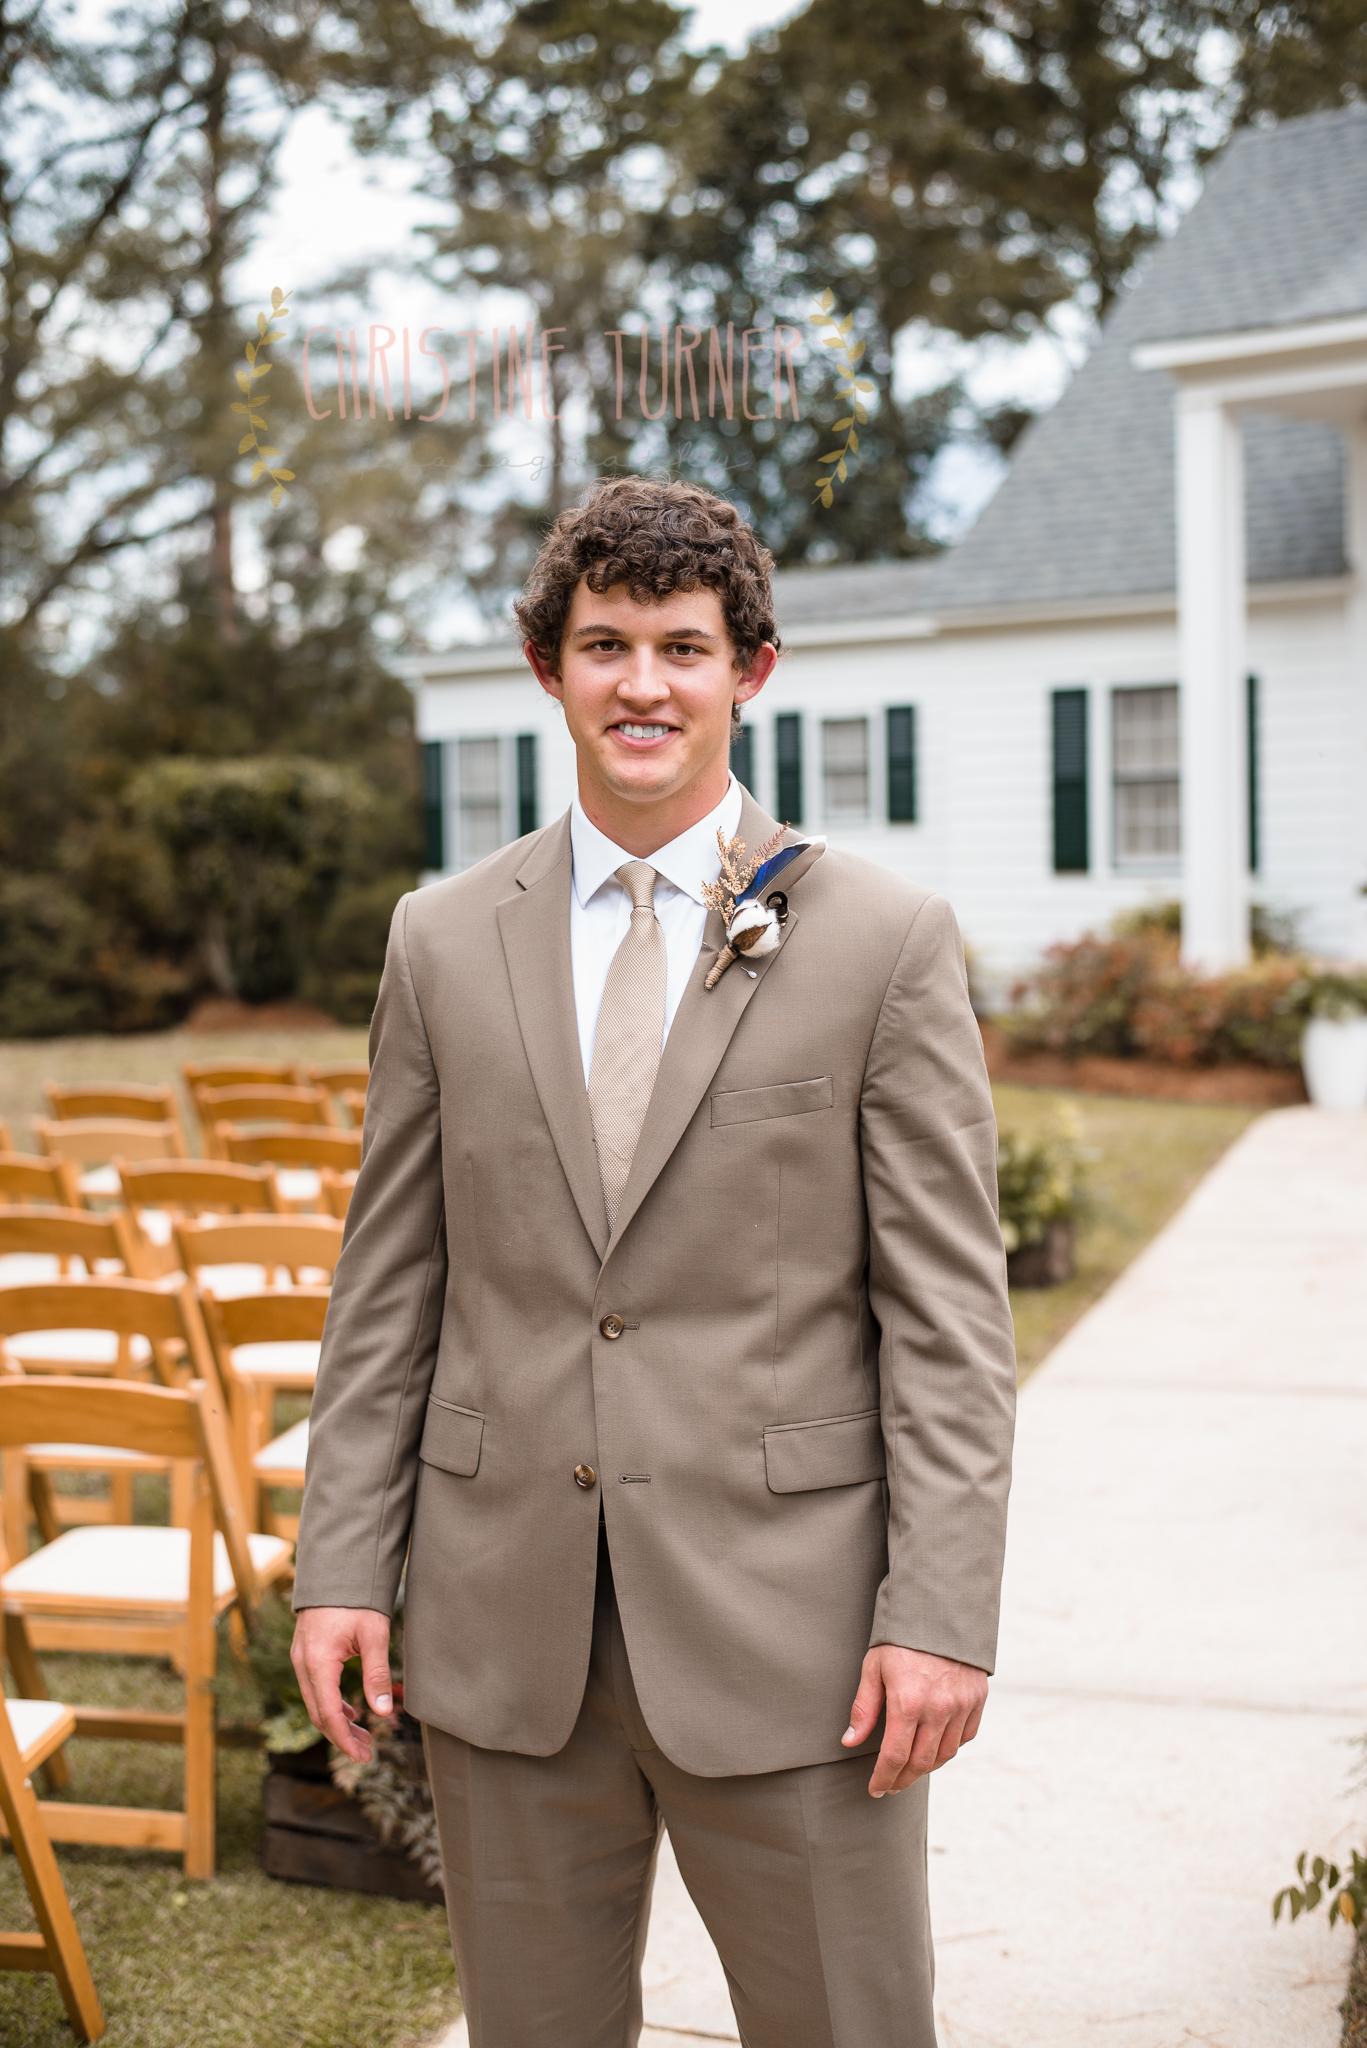 Gill Wedding (28 of 498)